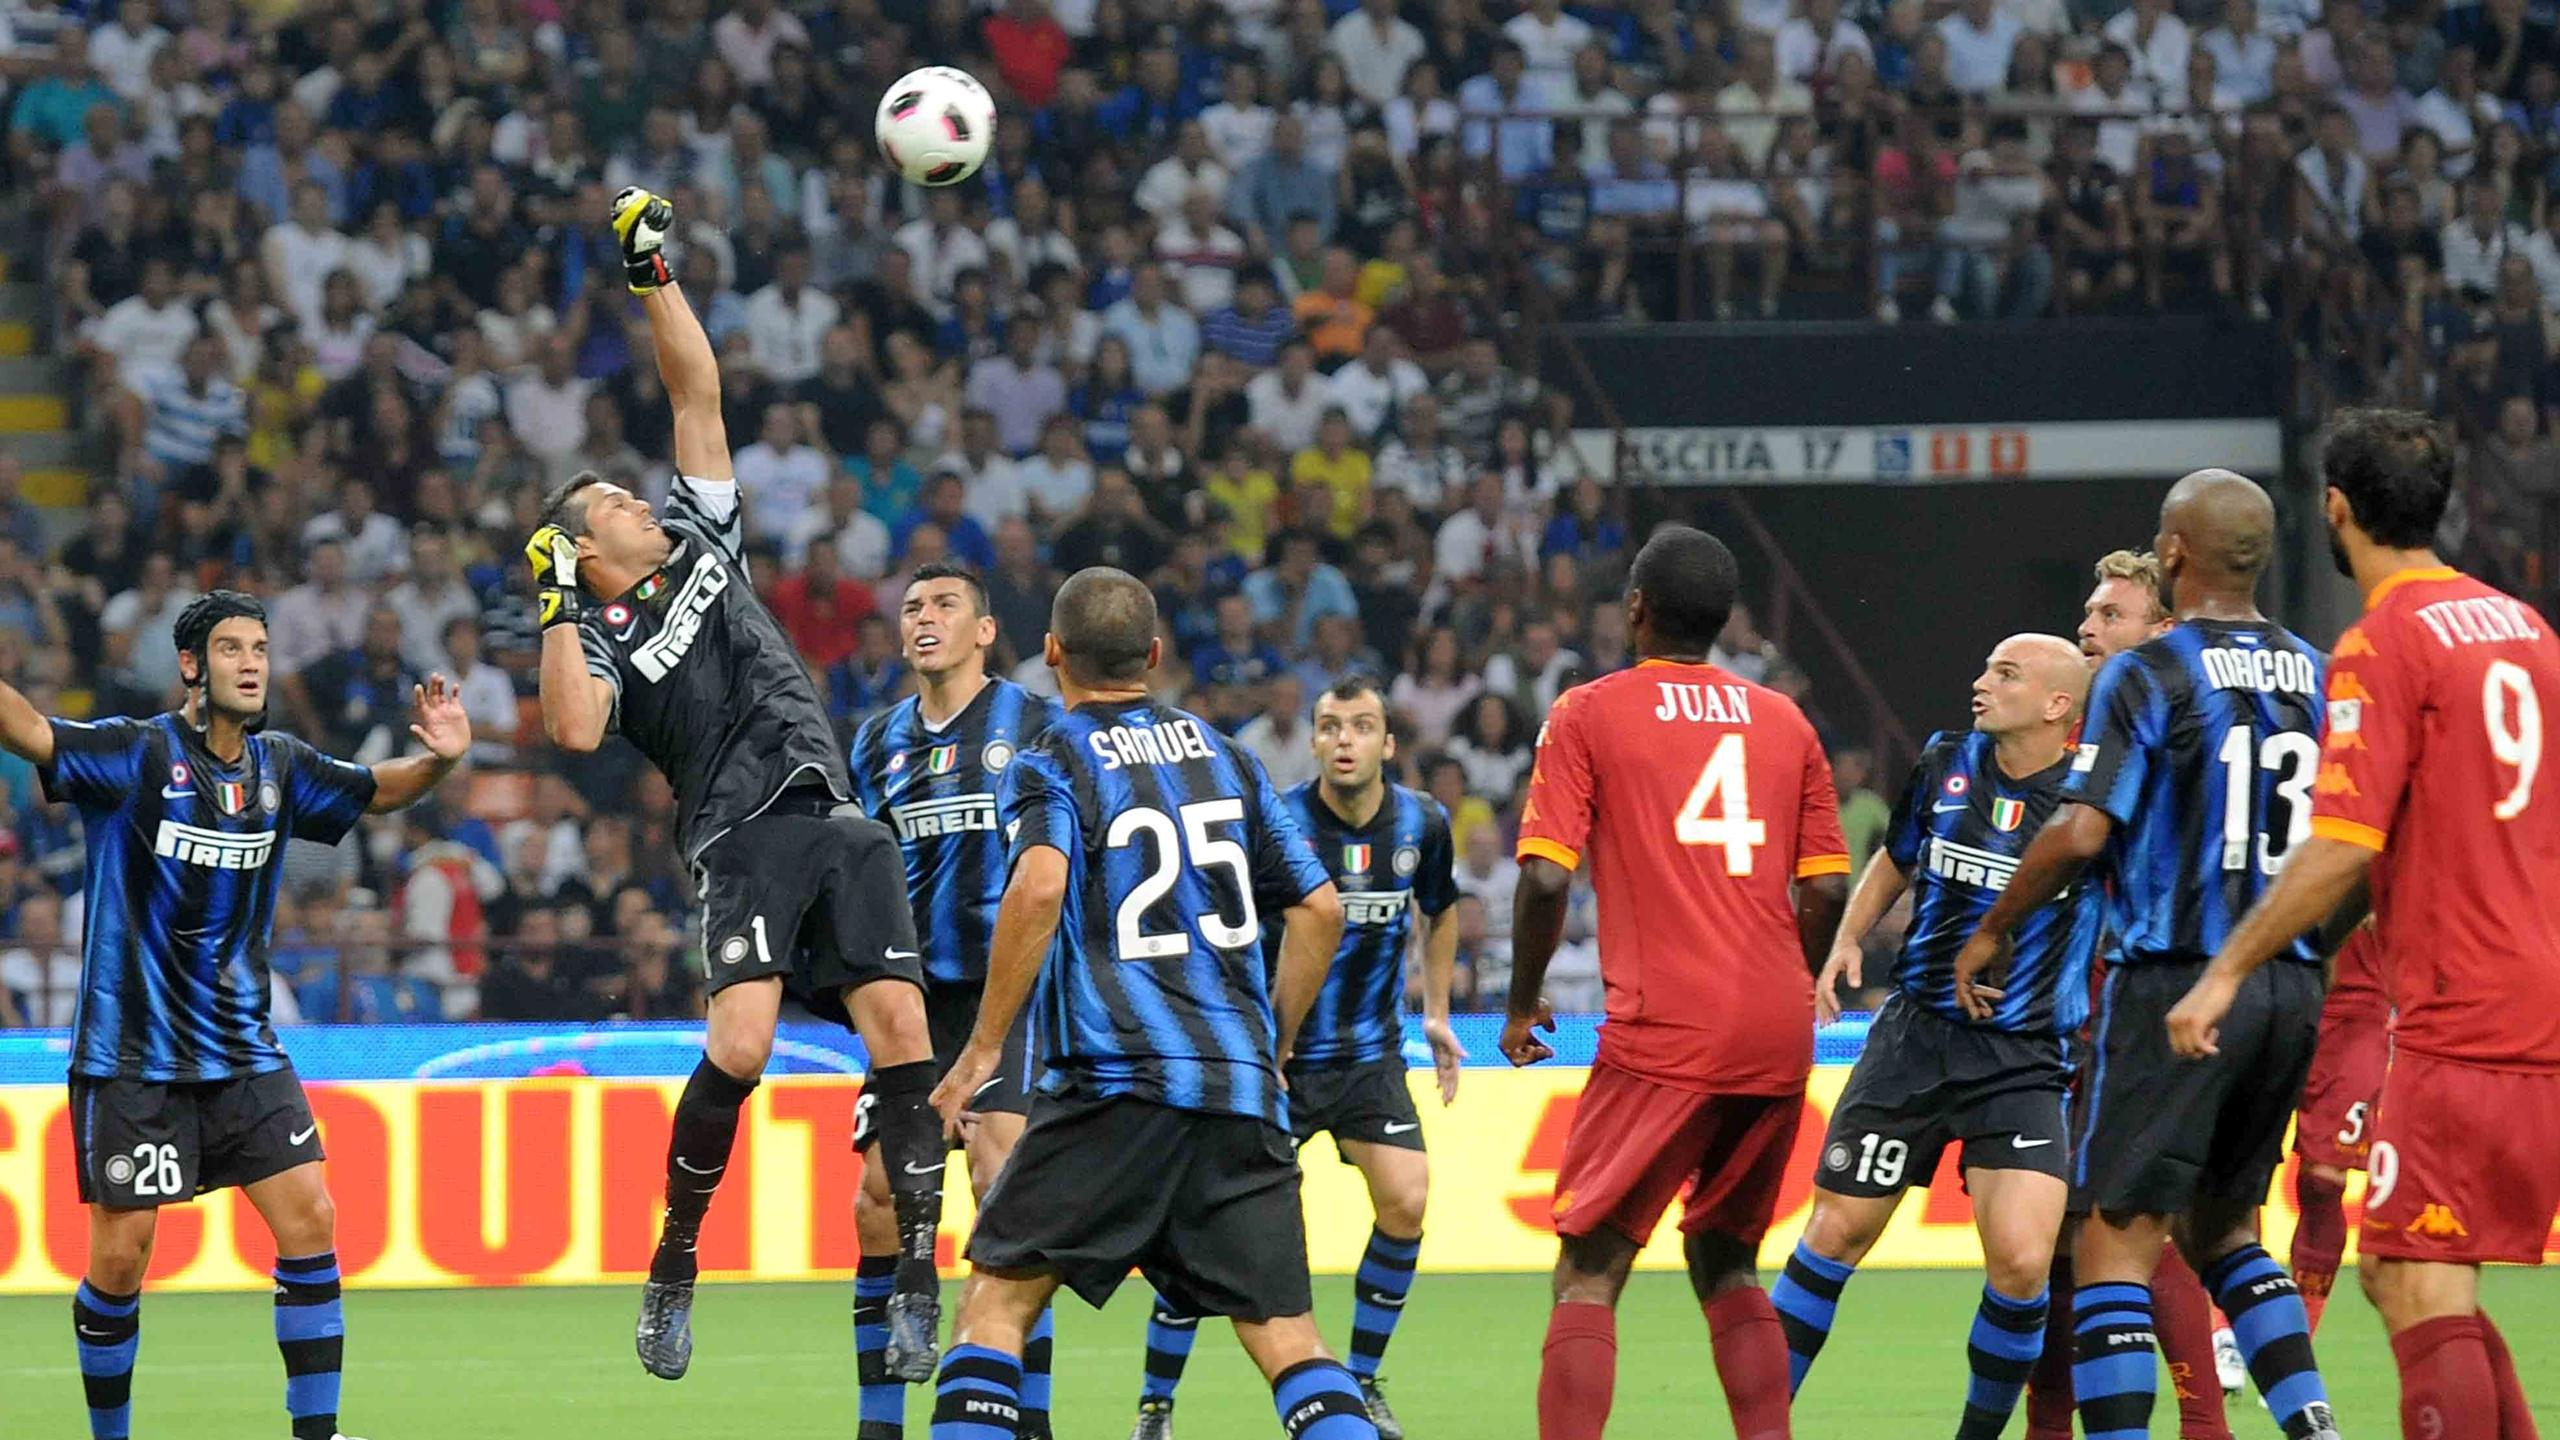 Чемпионат италии по футболу 2010 интер- милан